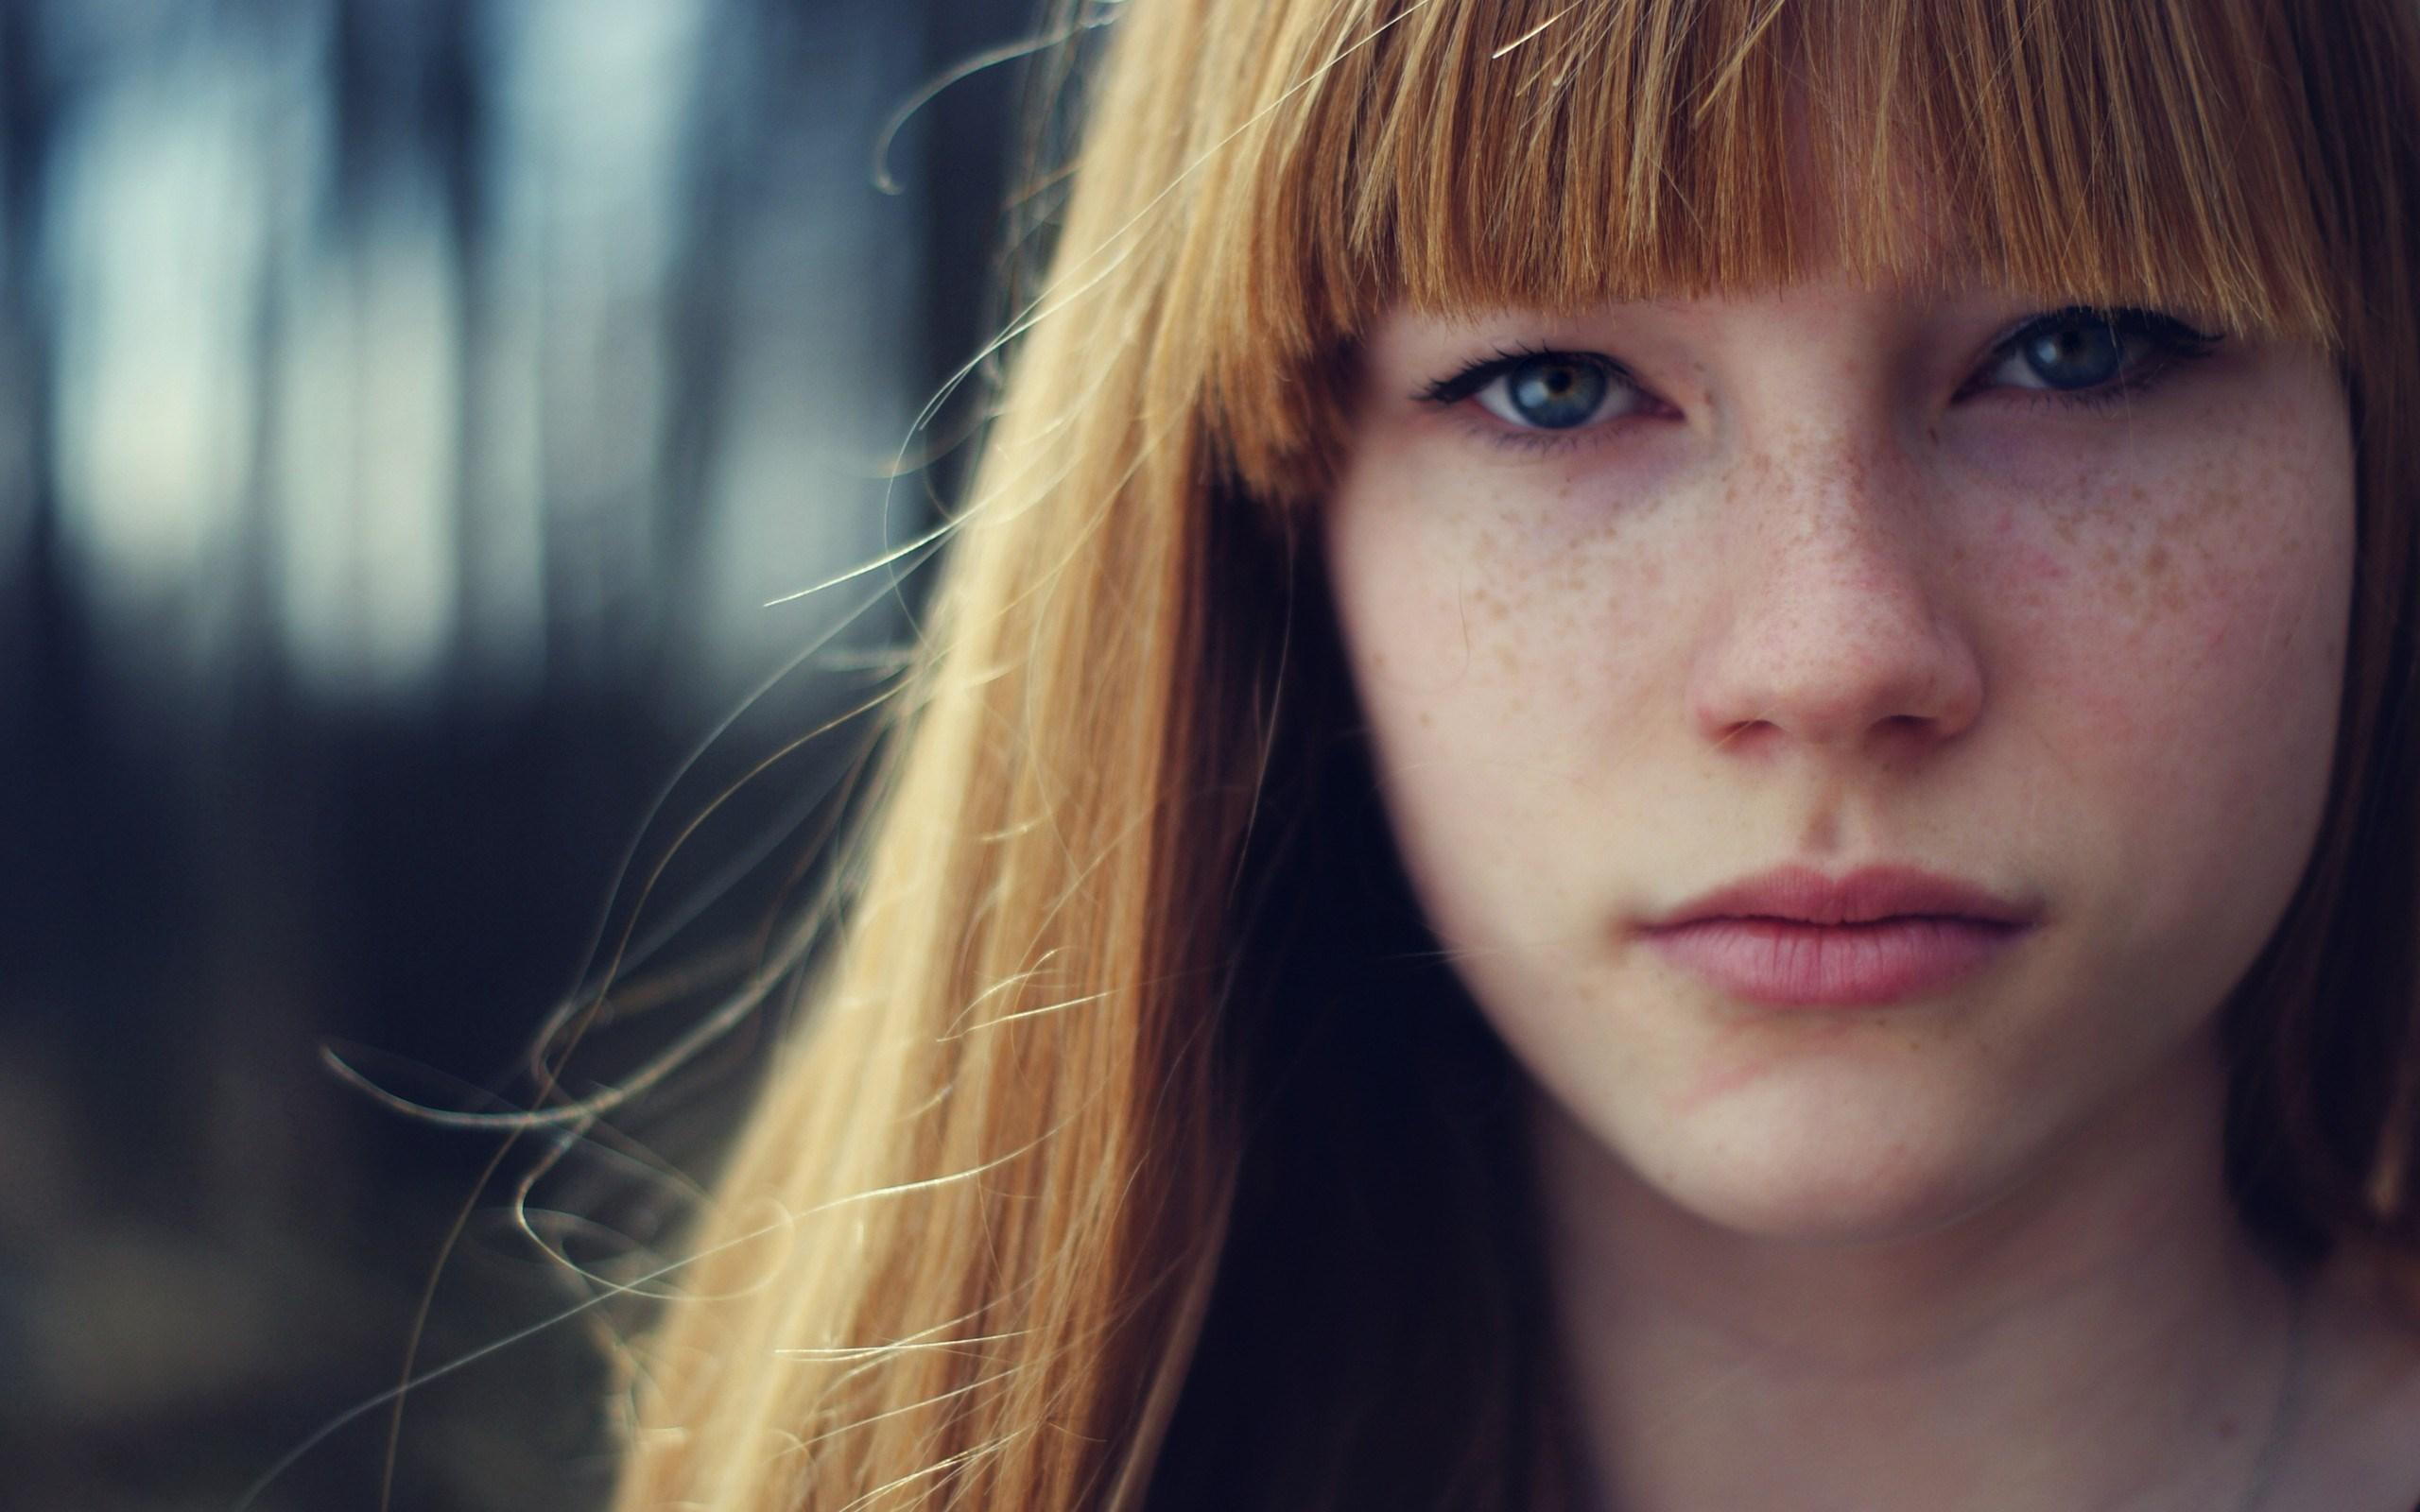 Freckles Girl Look